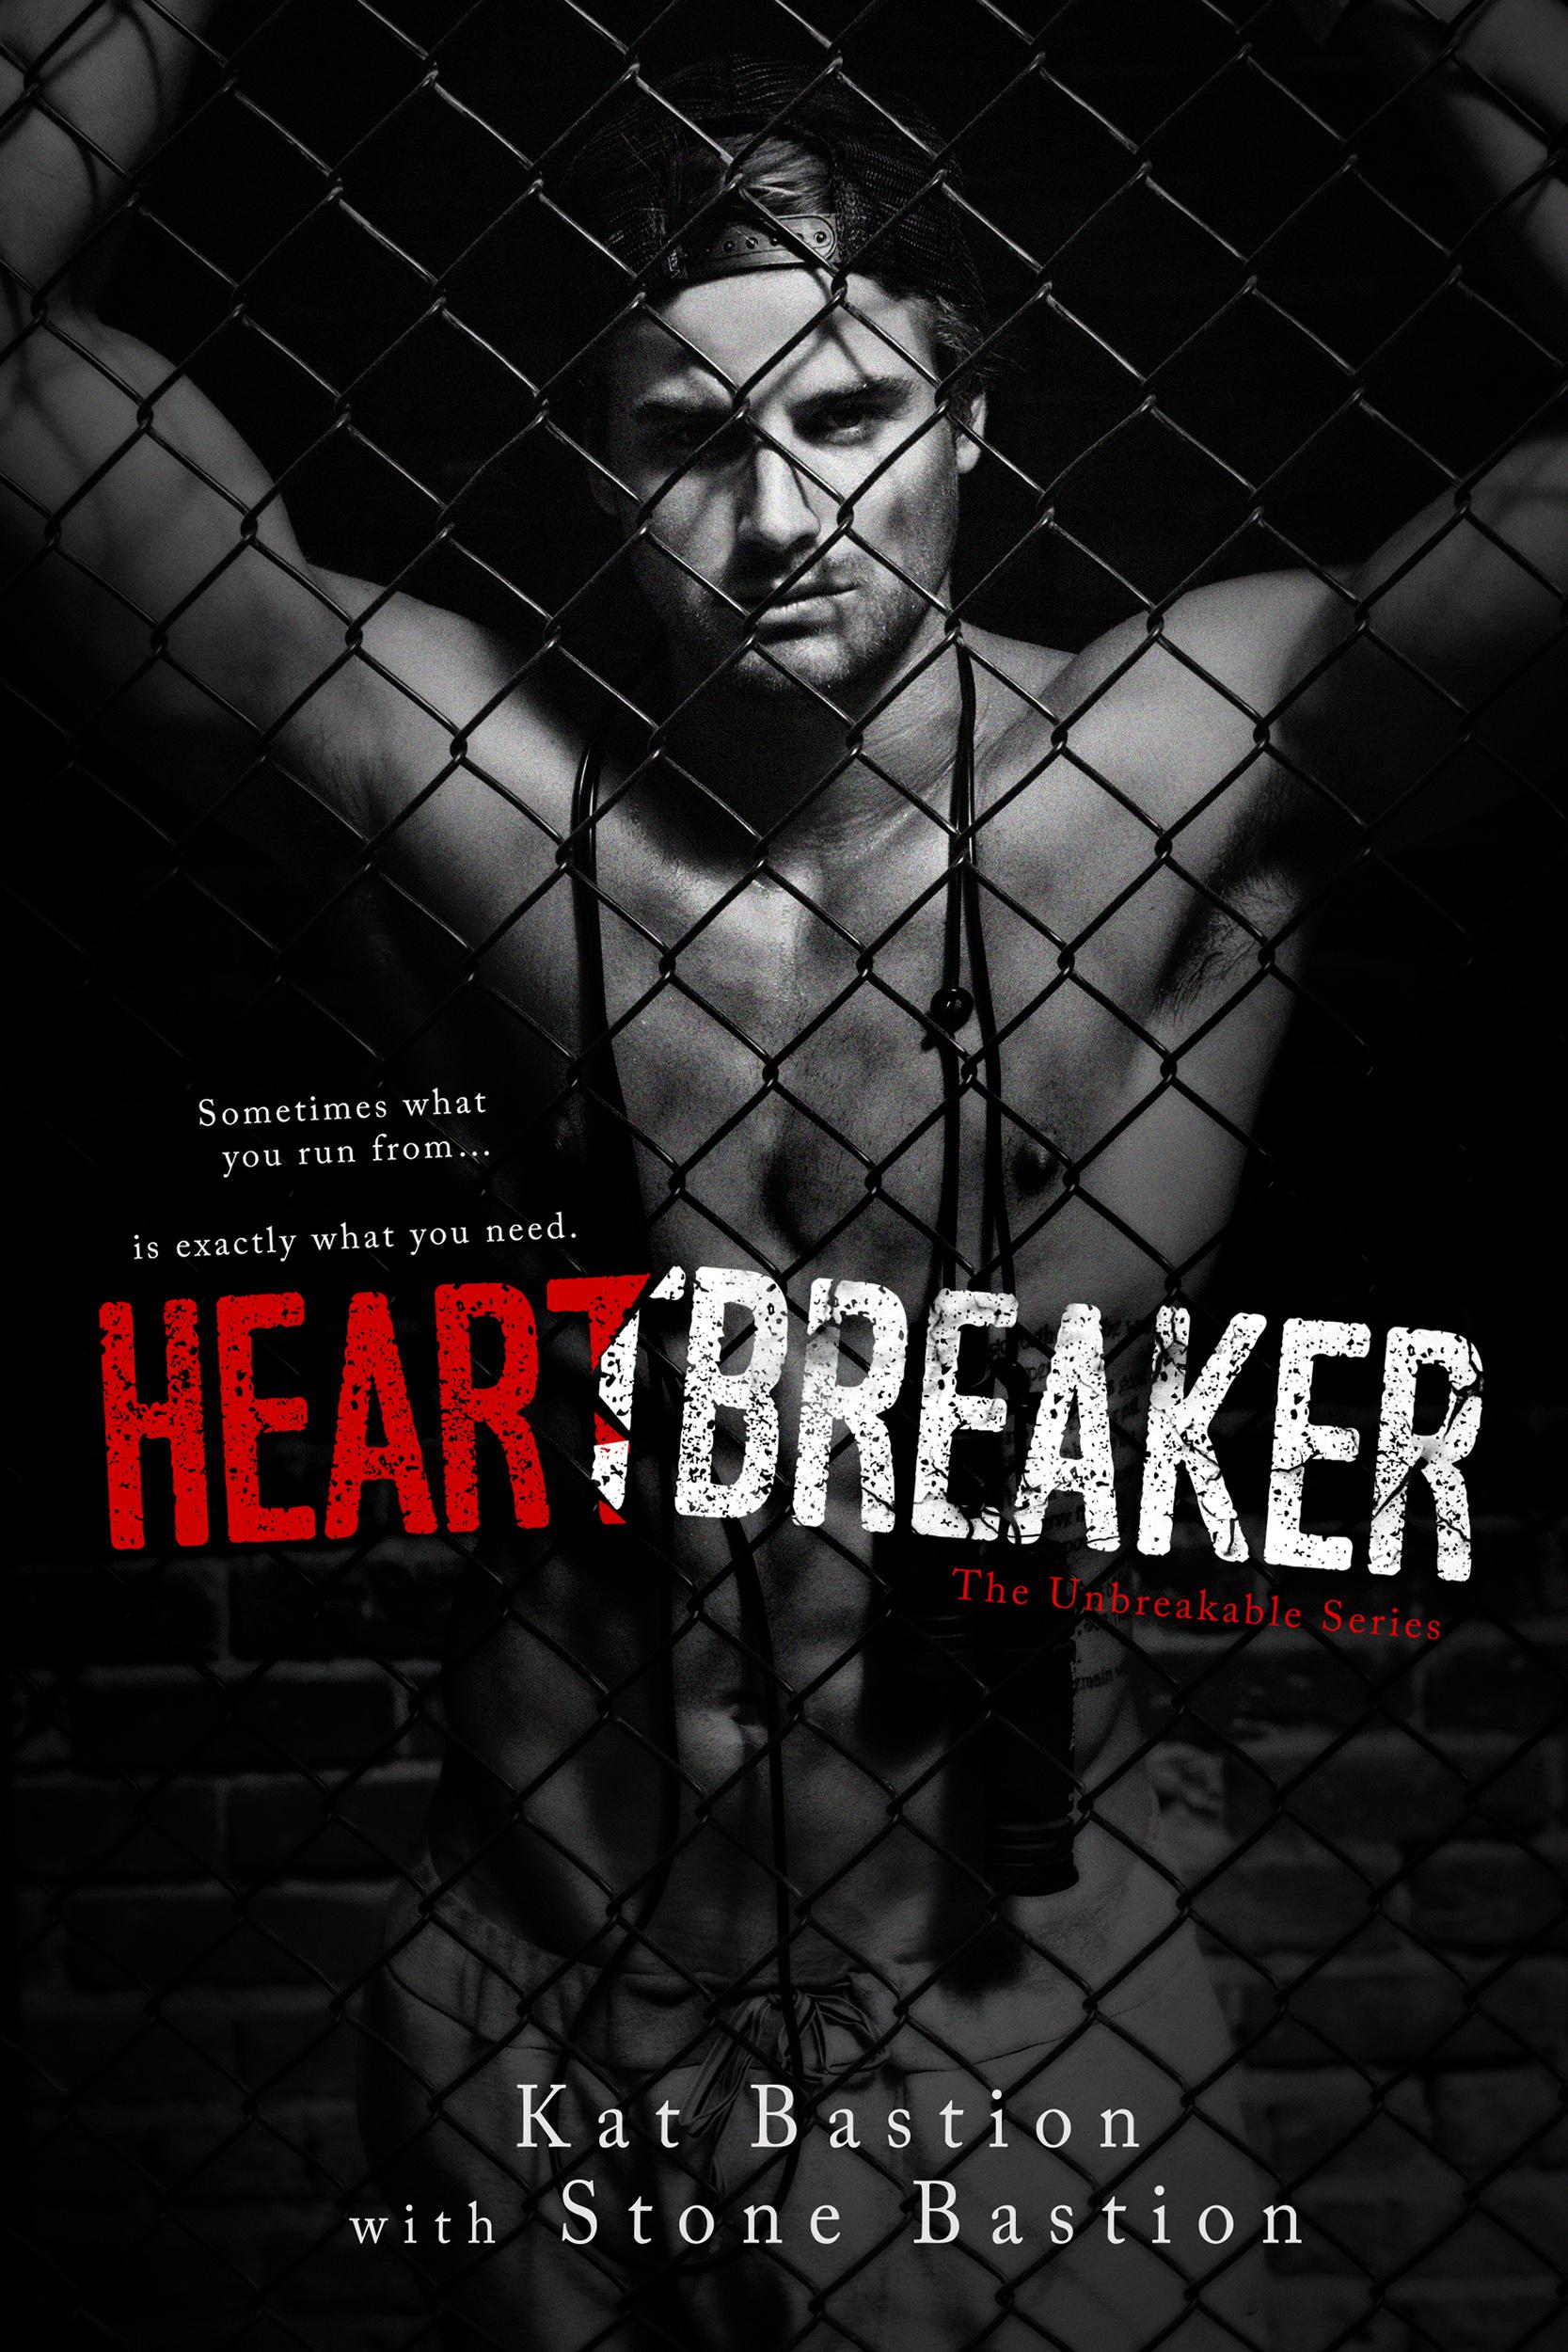 Heartbreaker Cover Amazon